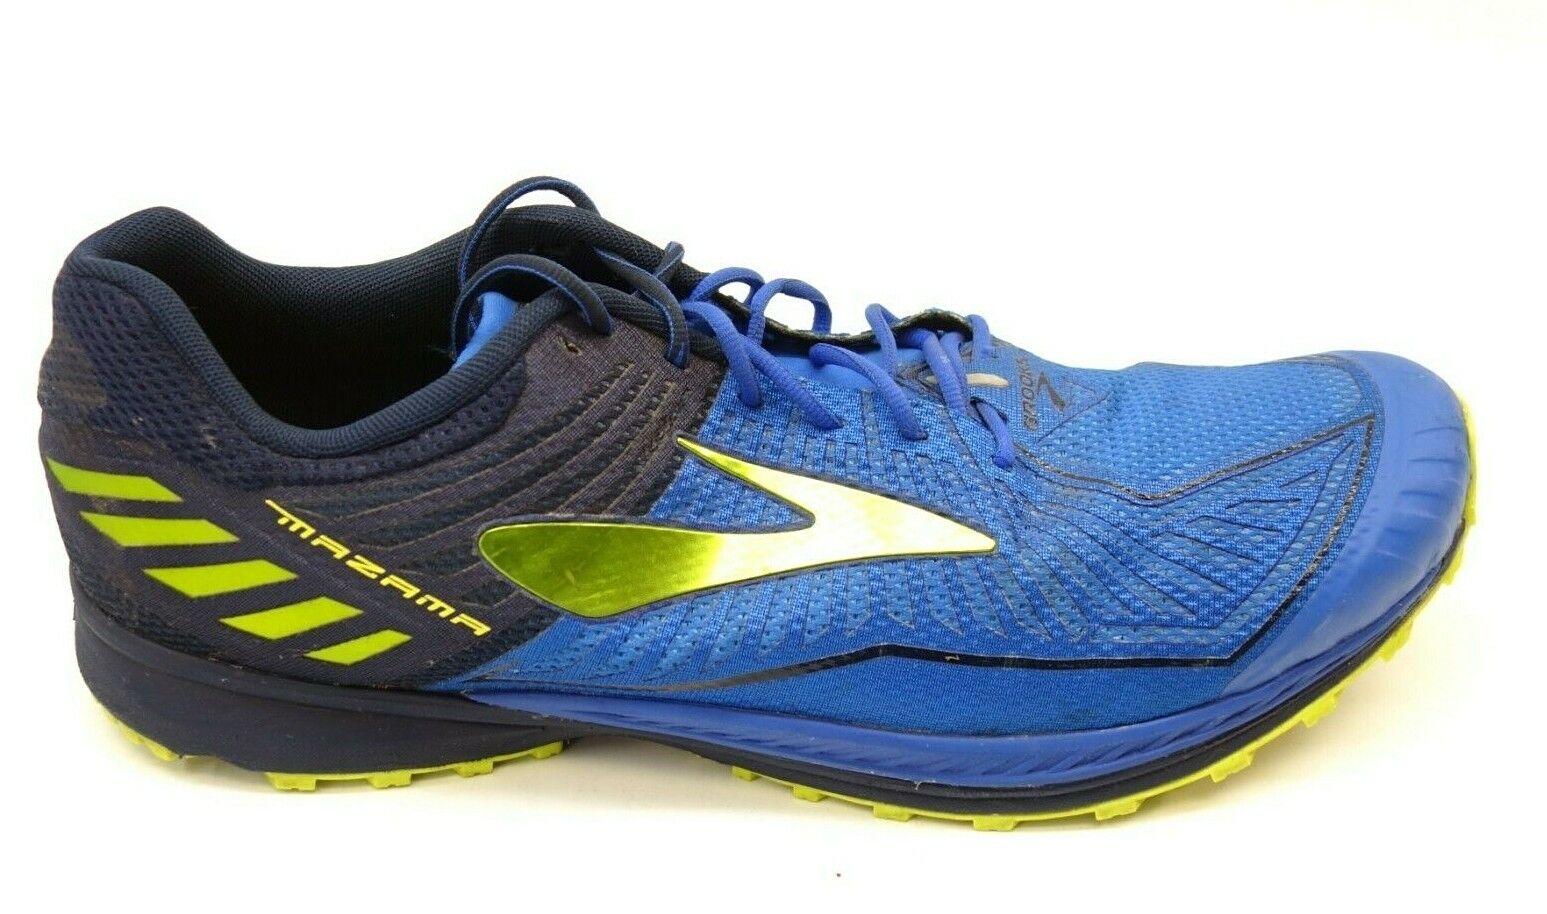 Brooks Mens Mazama Blau Athletic Running Cross Training Mesh Low schuhe Größe 13